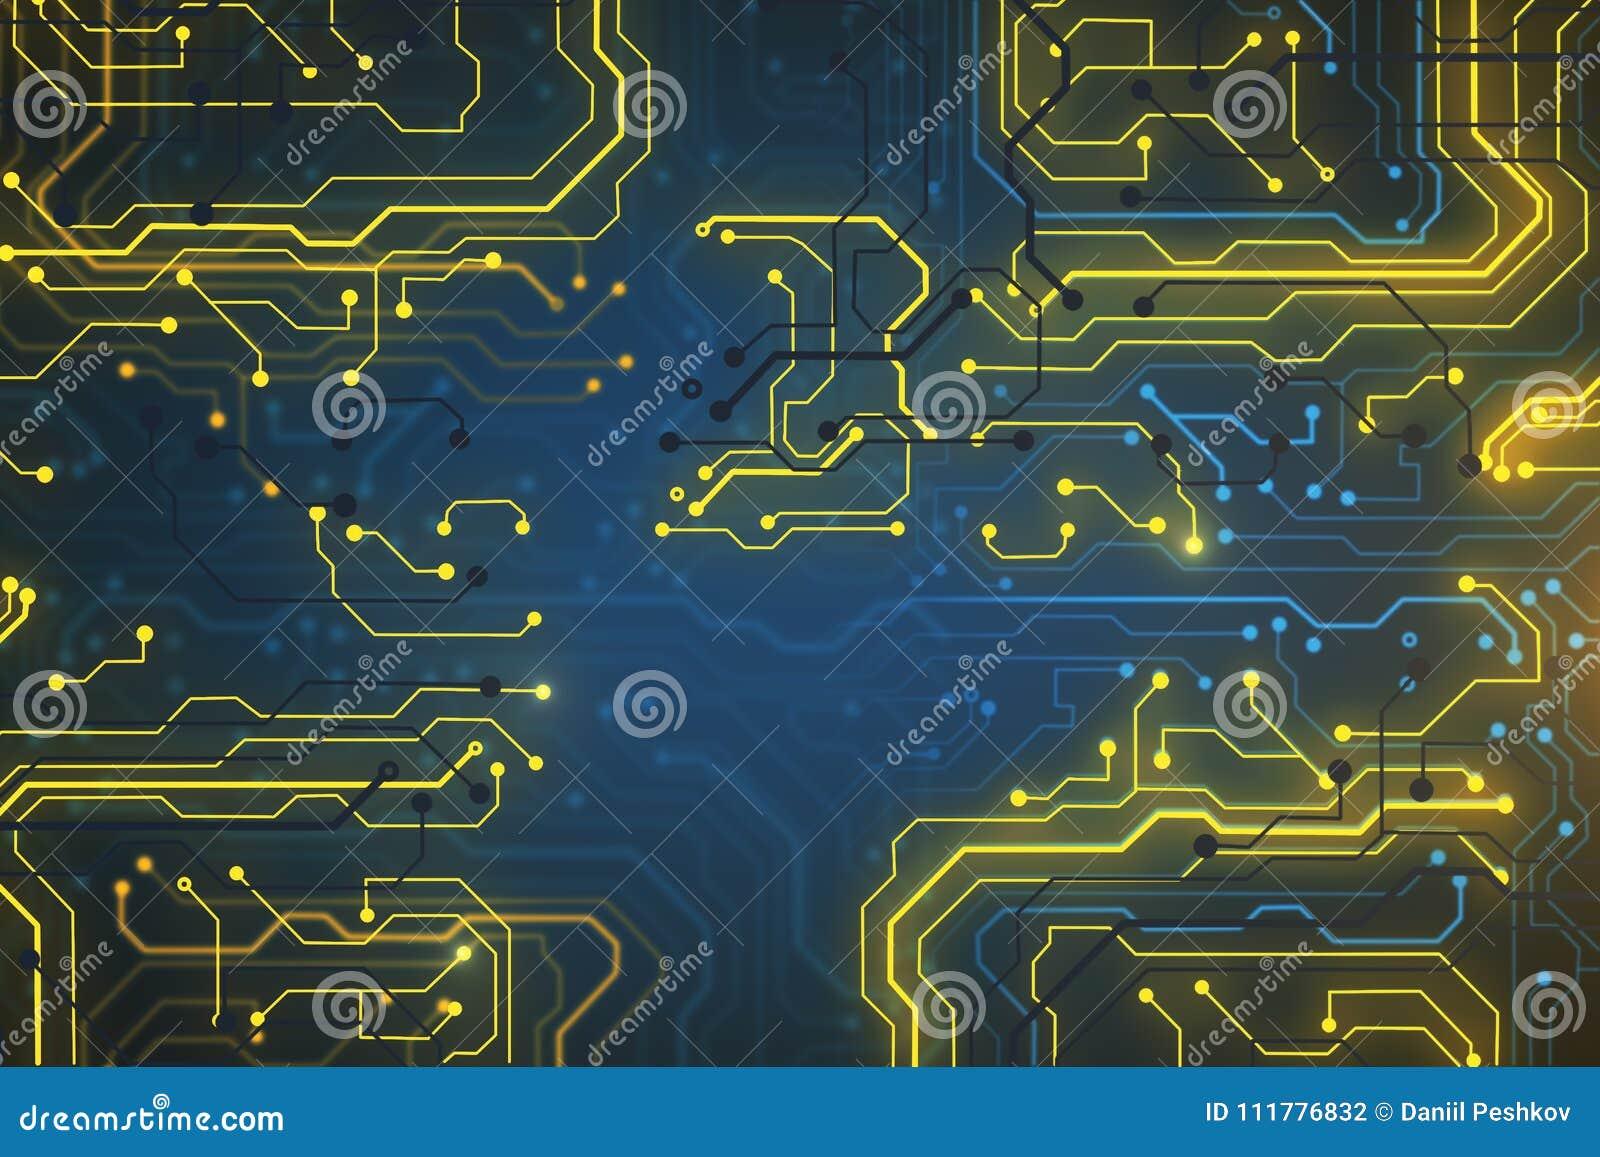 Creative circuit backdrop